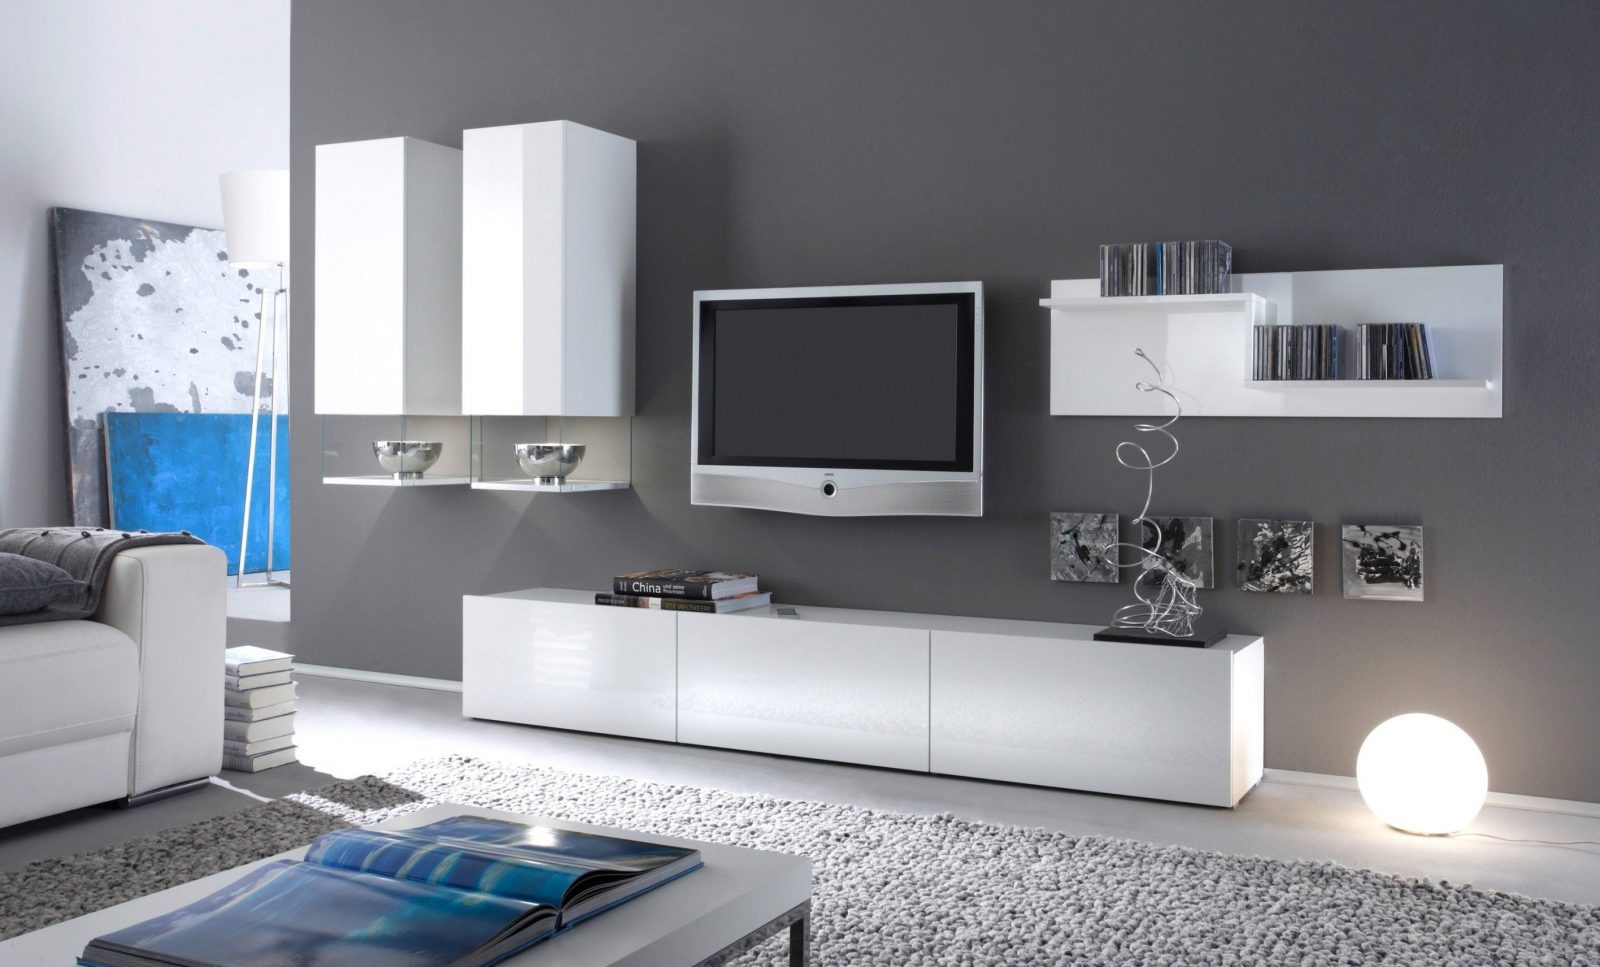 Luxuriös 43 Wohnwand Weiß Ikea Dekoration Bilder Ideen Zum Wohnwand von Wohnwand Weiß Hochglanz Ikea Photo